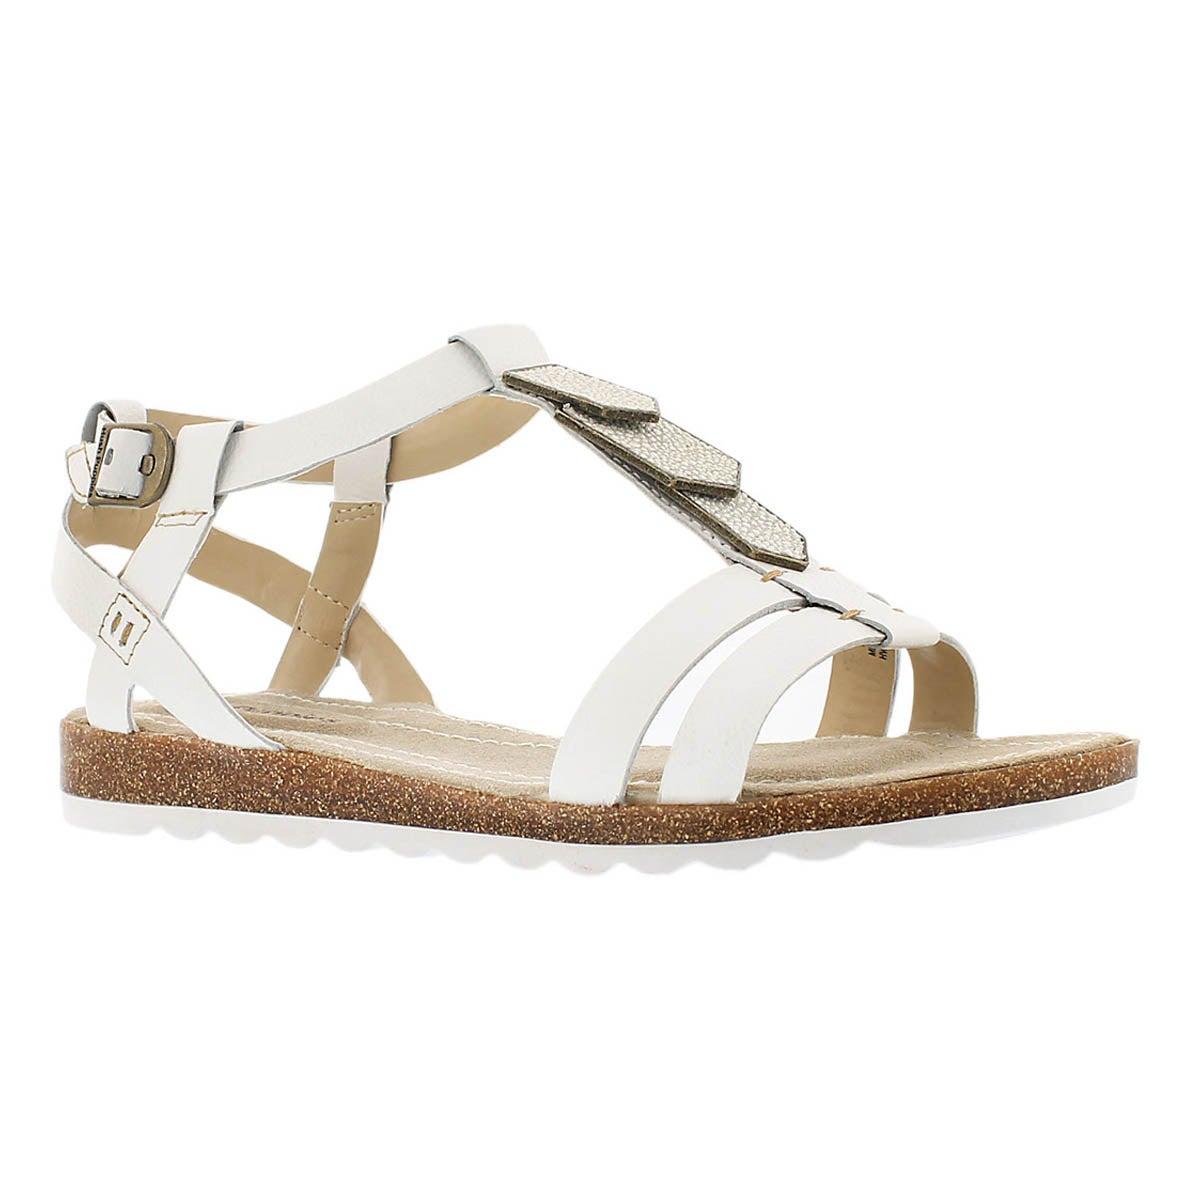 Sandale gladiateur Bretta Jade, blc, fem